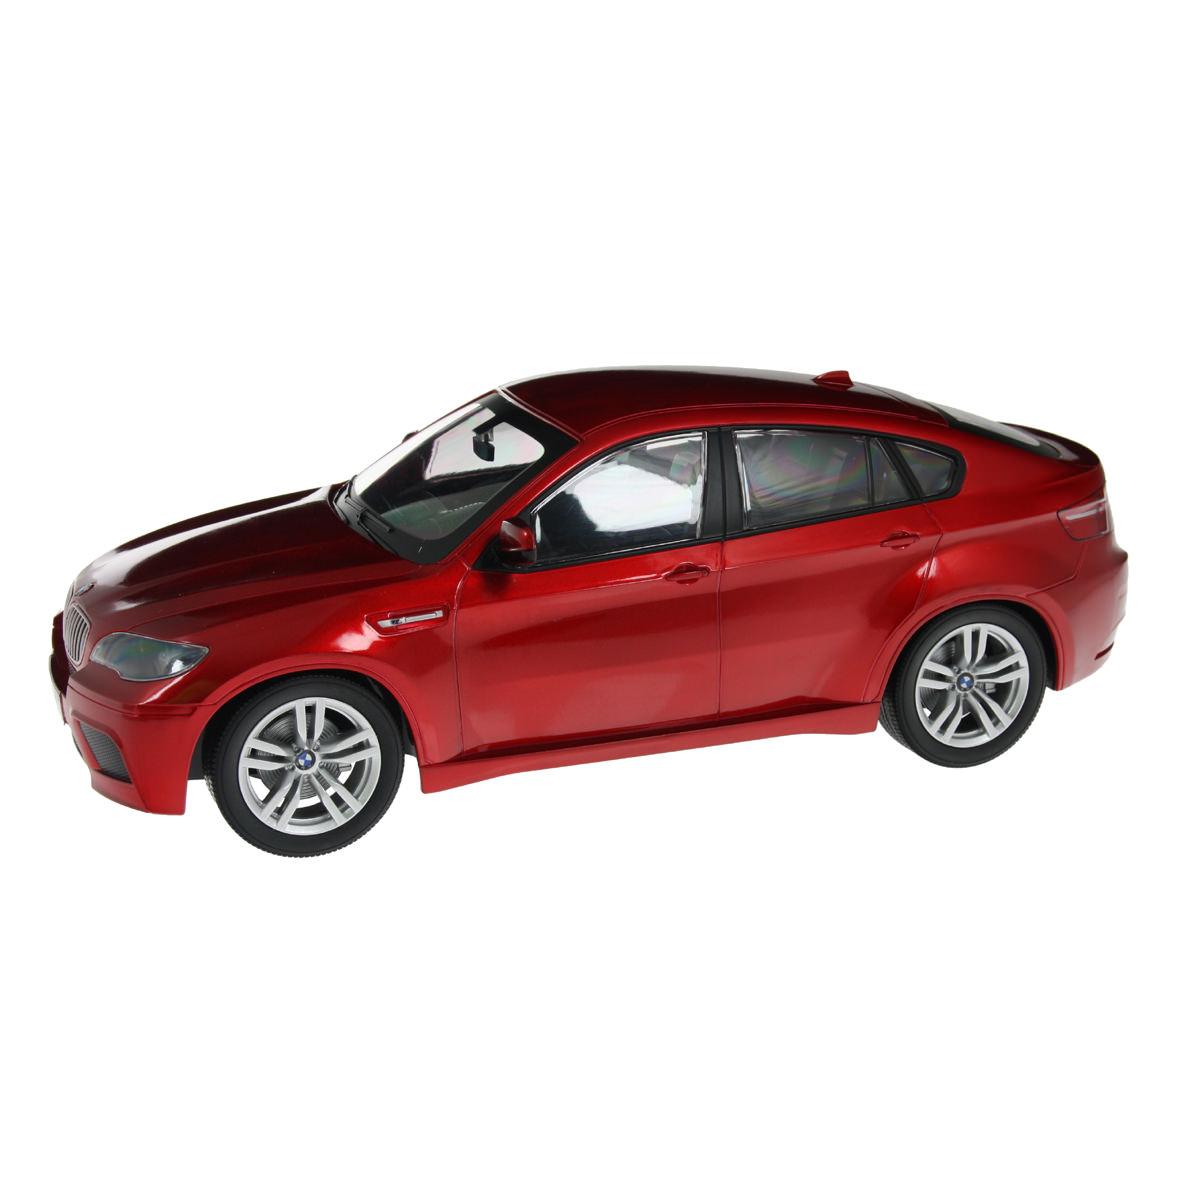 Bmw X6 M: MJX 8541A Red BMW X6 M-Edition RC Car At Hobby Warehouse